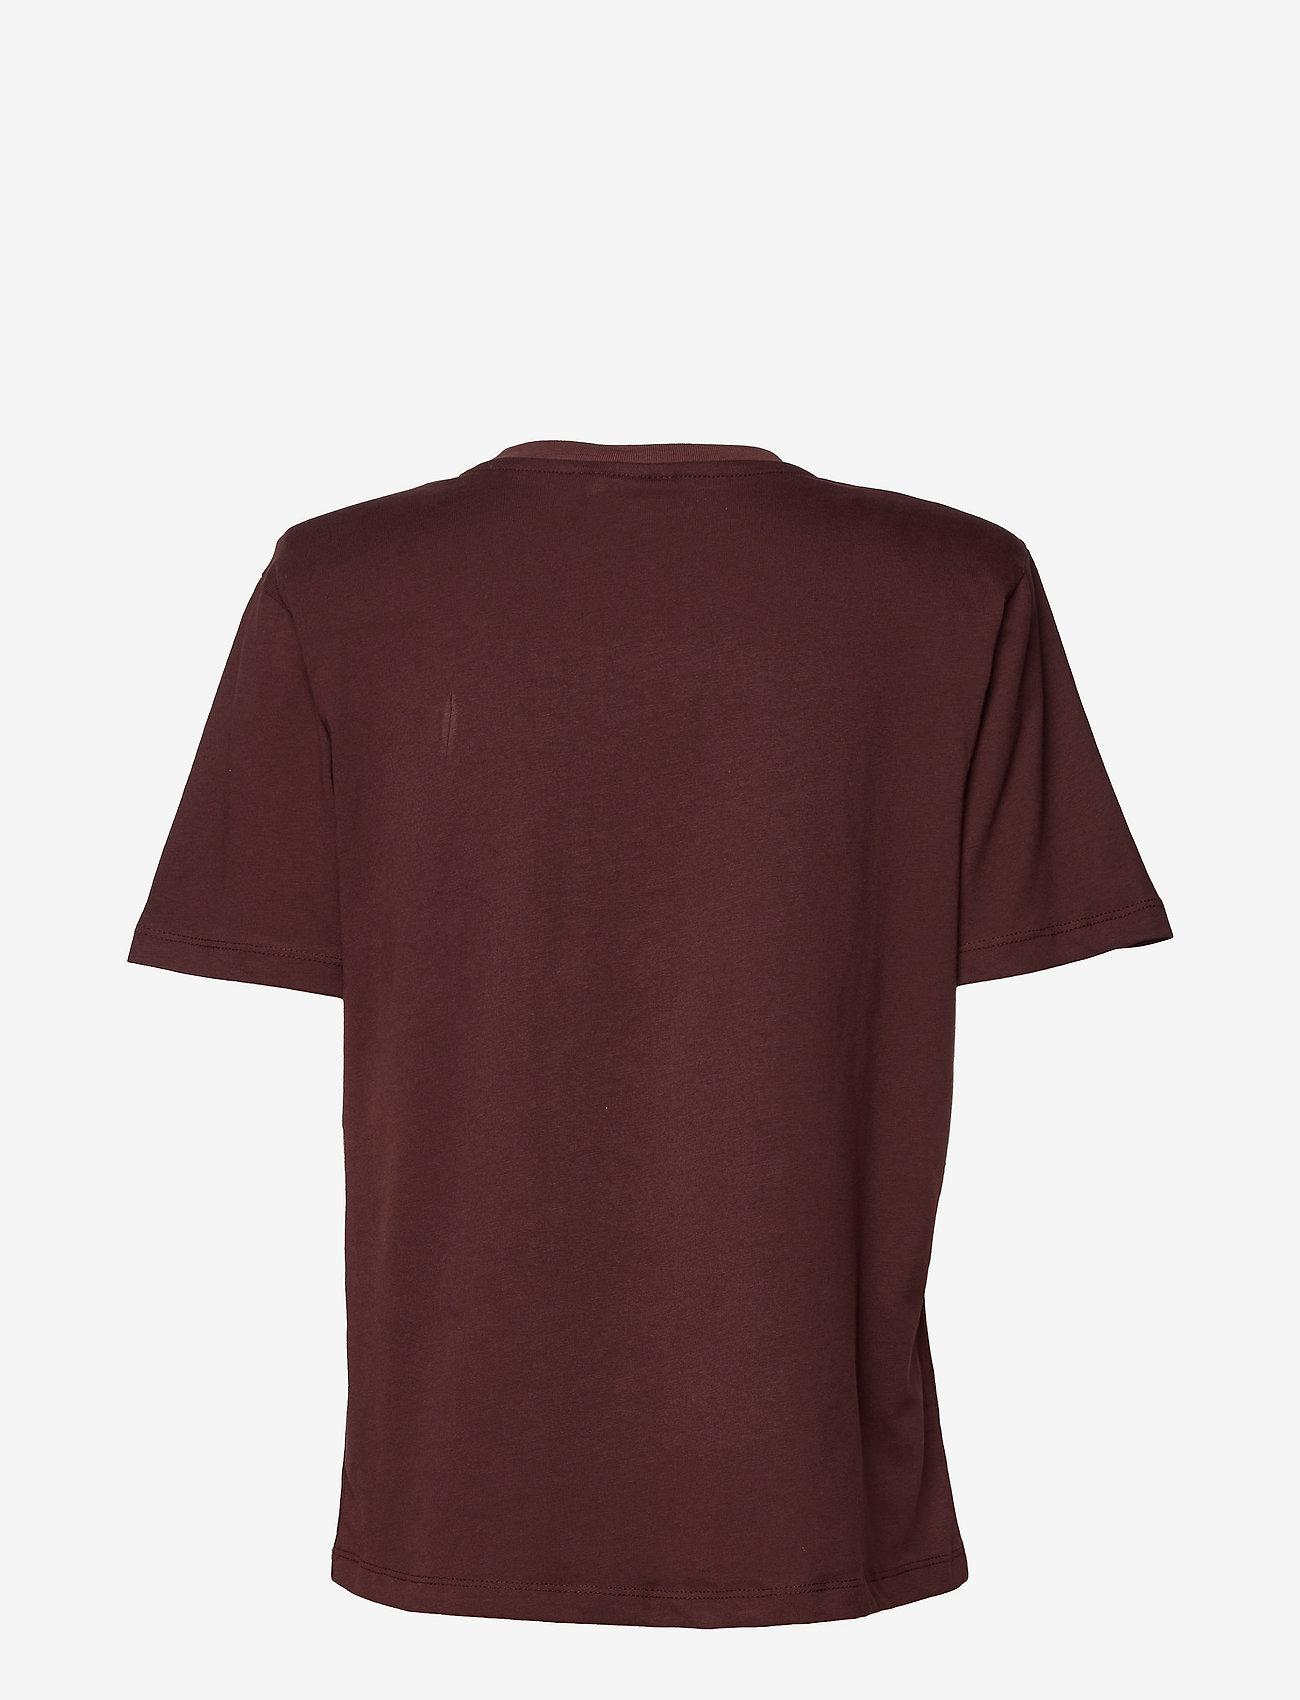 Gestuz - JoryGZ tee - t-shirts - decadent chocolate - 1